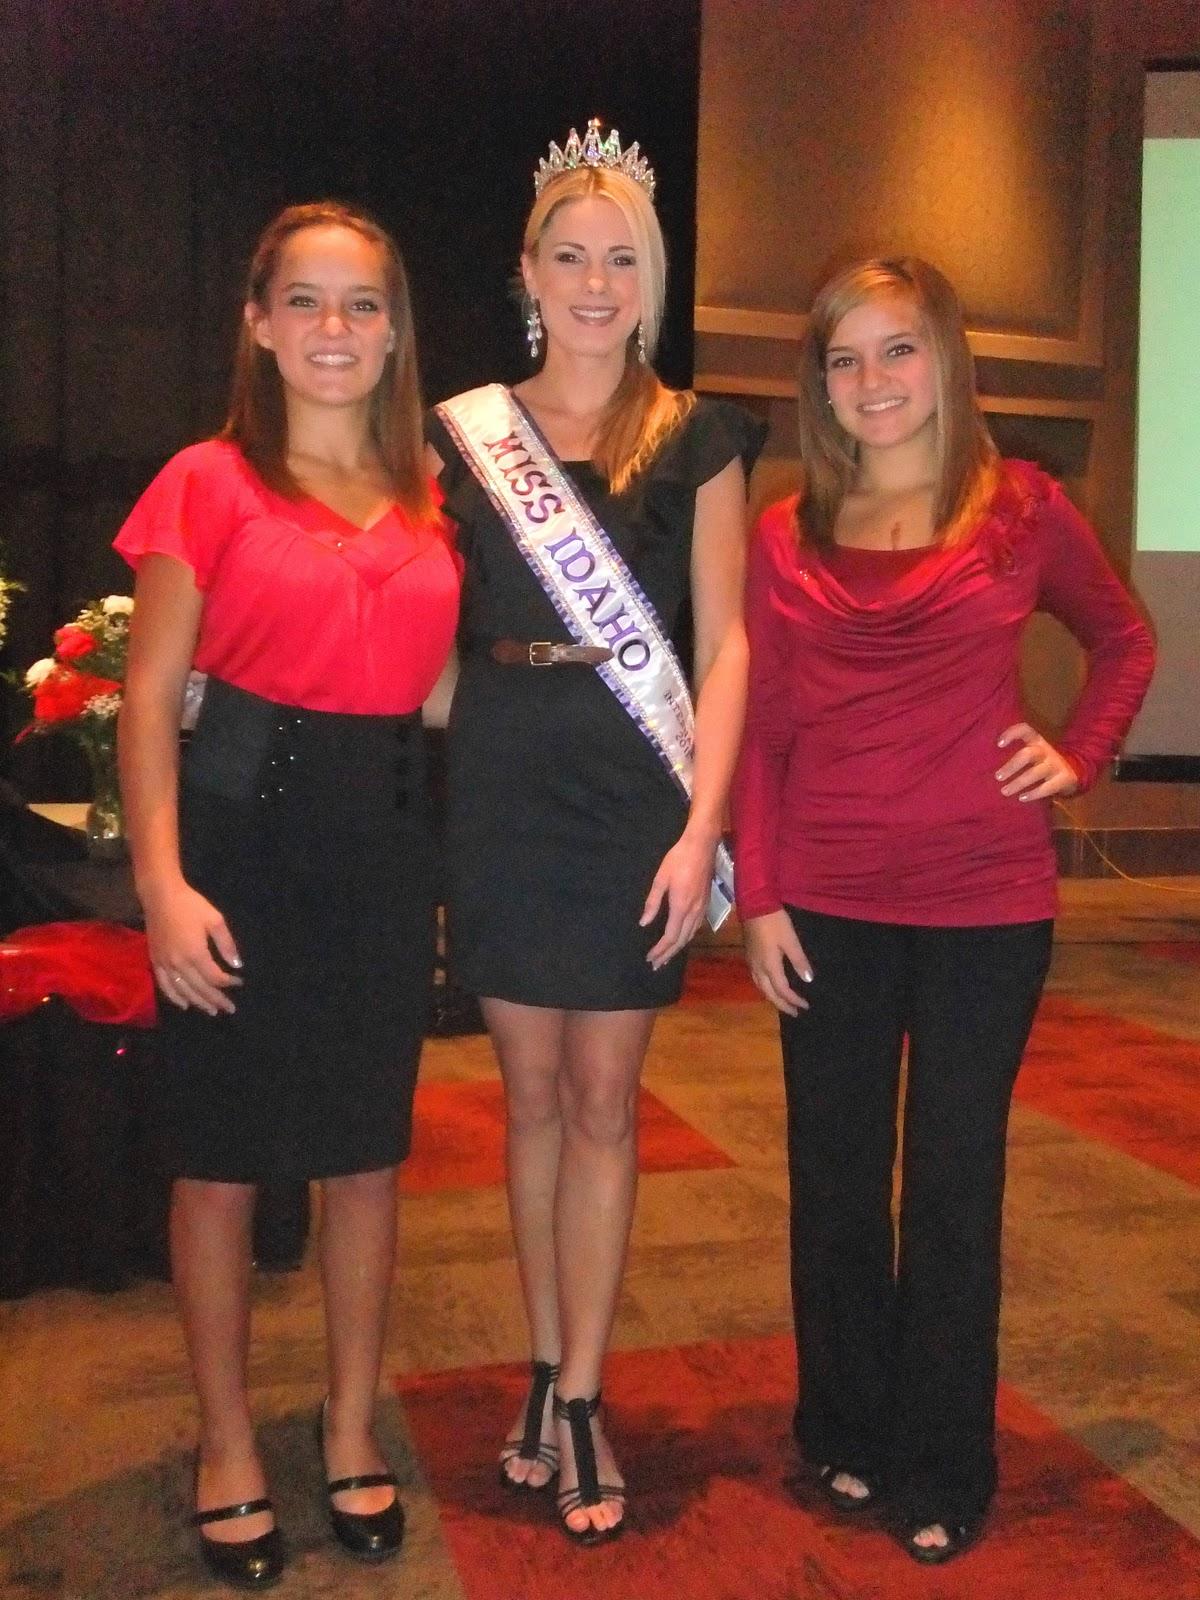 Heather Marie Mallary-Orchard: Miss Idaho USA 2011 Pageant